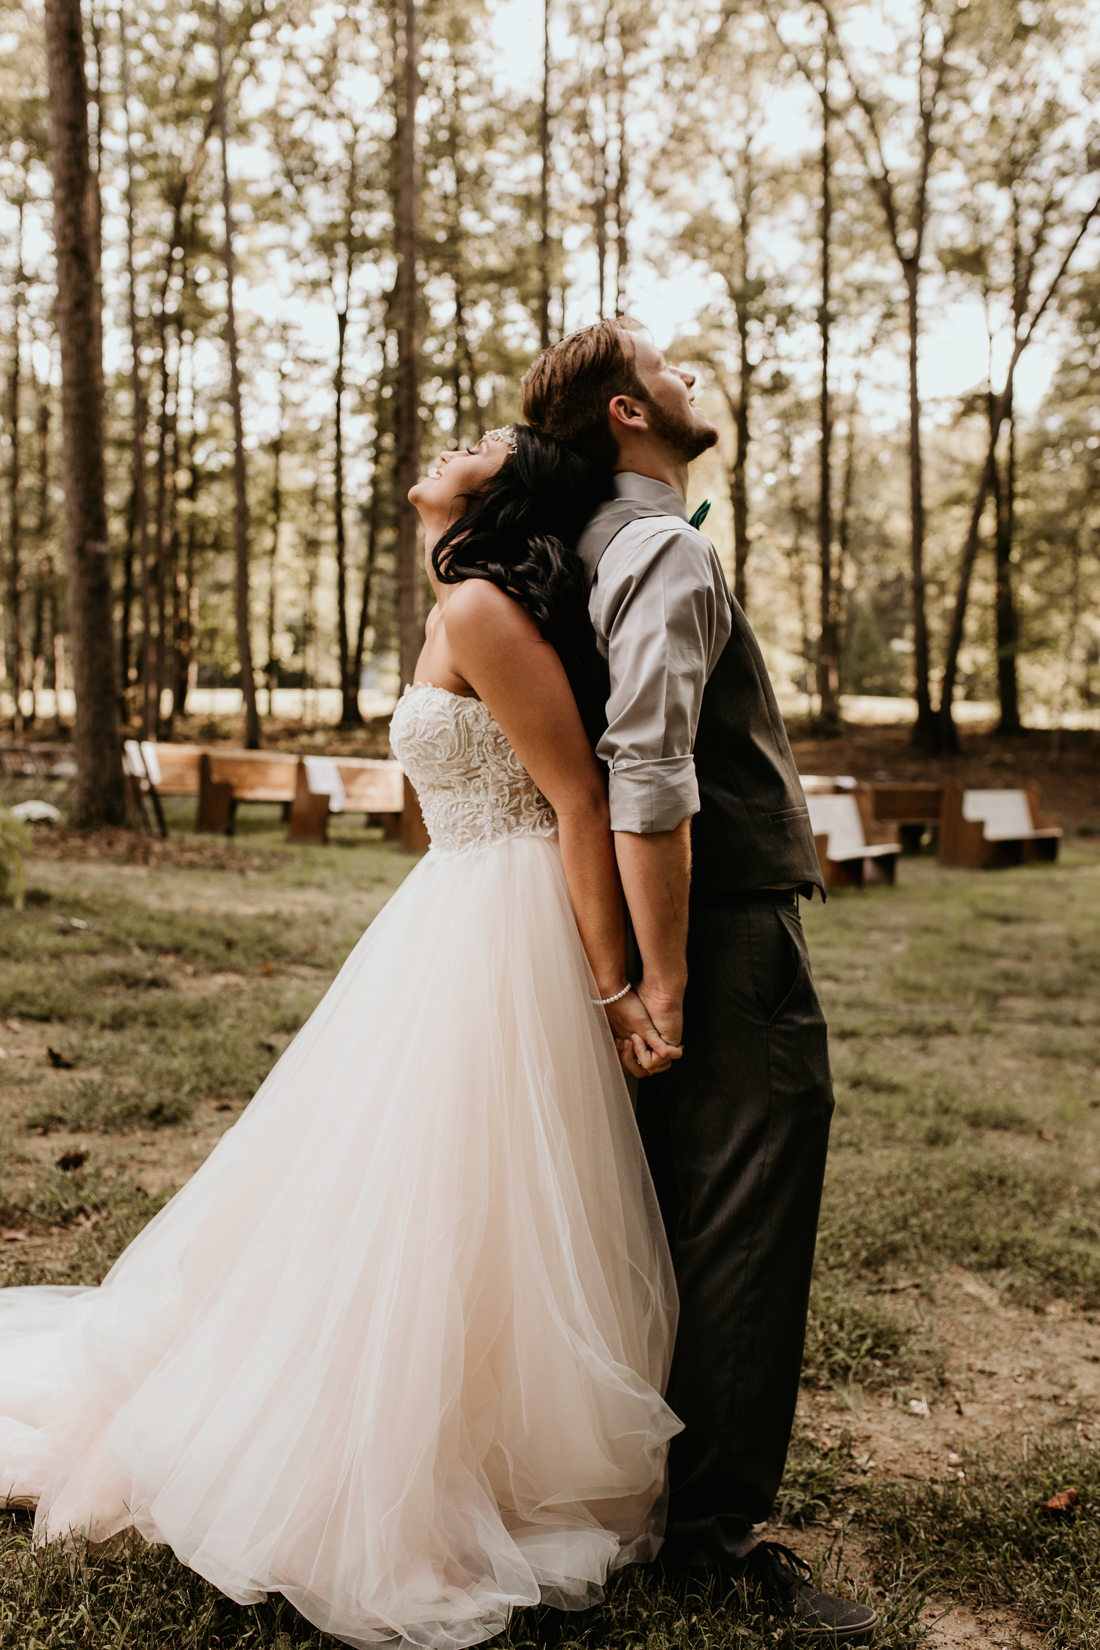 olivia_zay_wedding_09_2018-8737.jpg